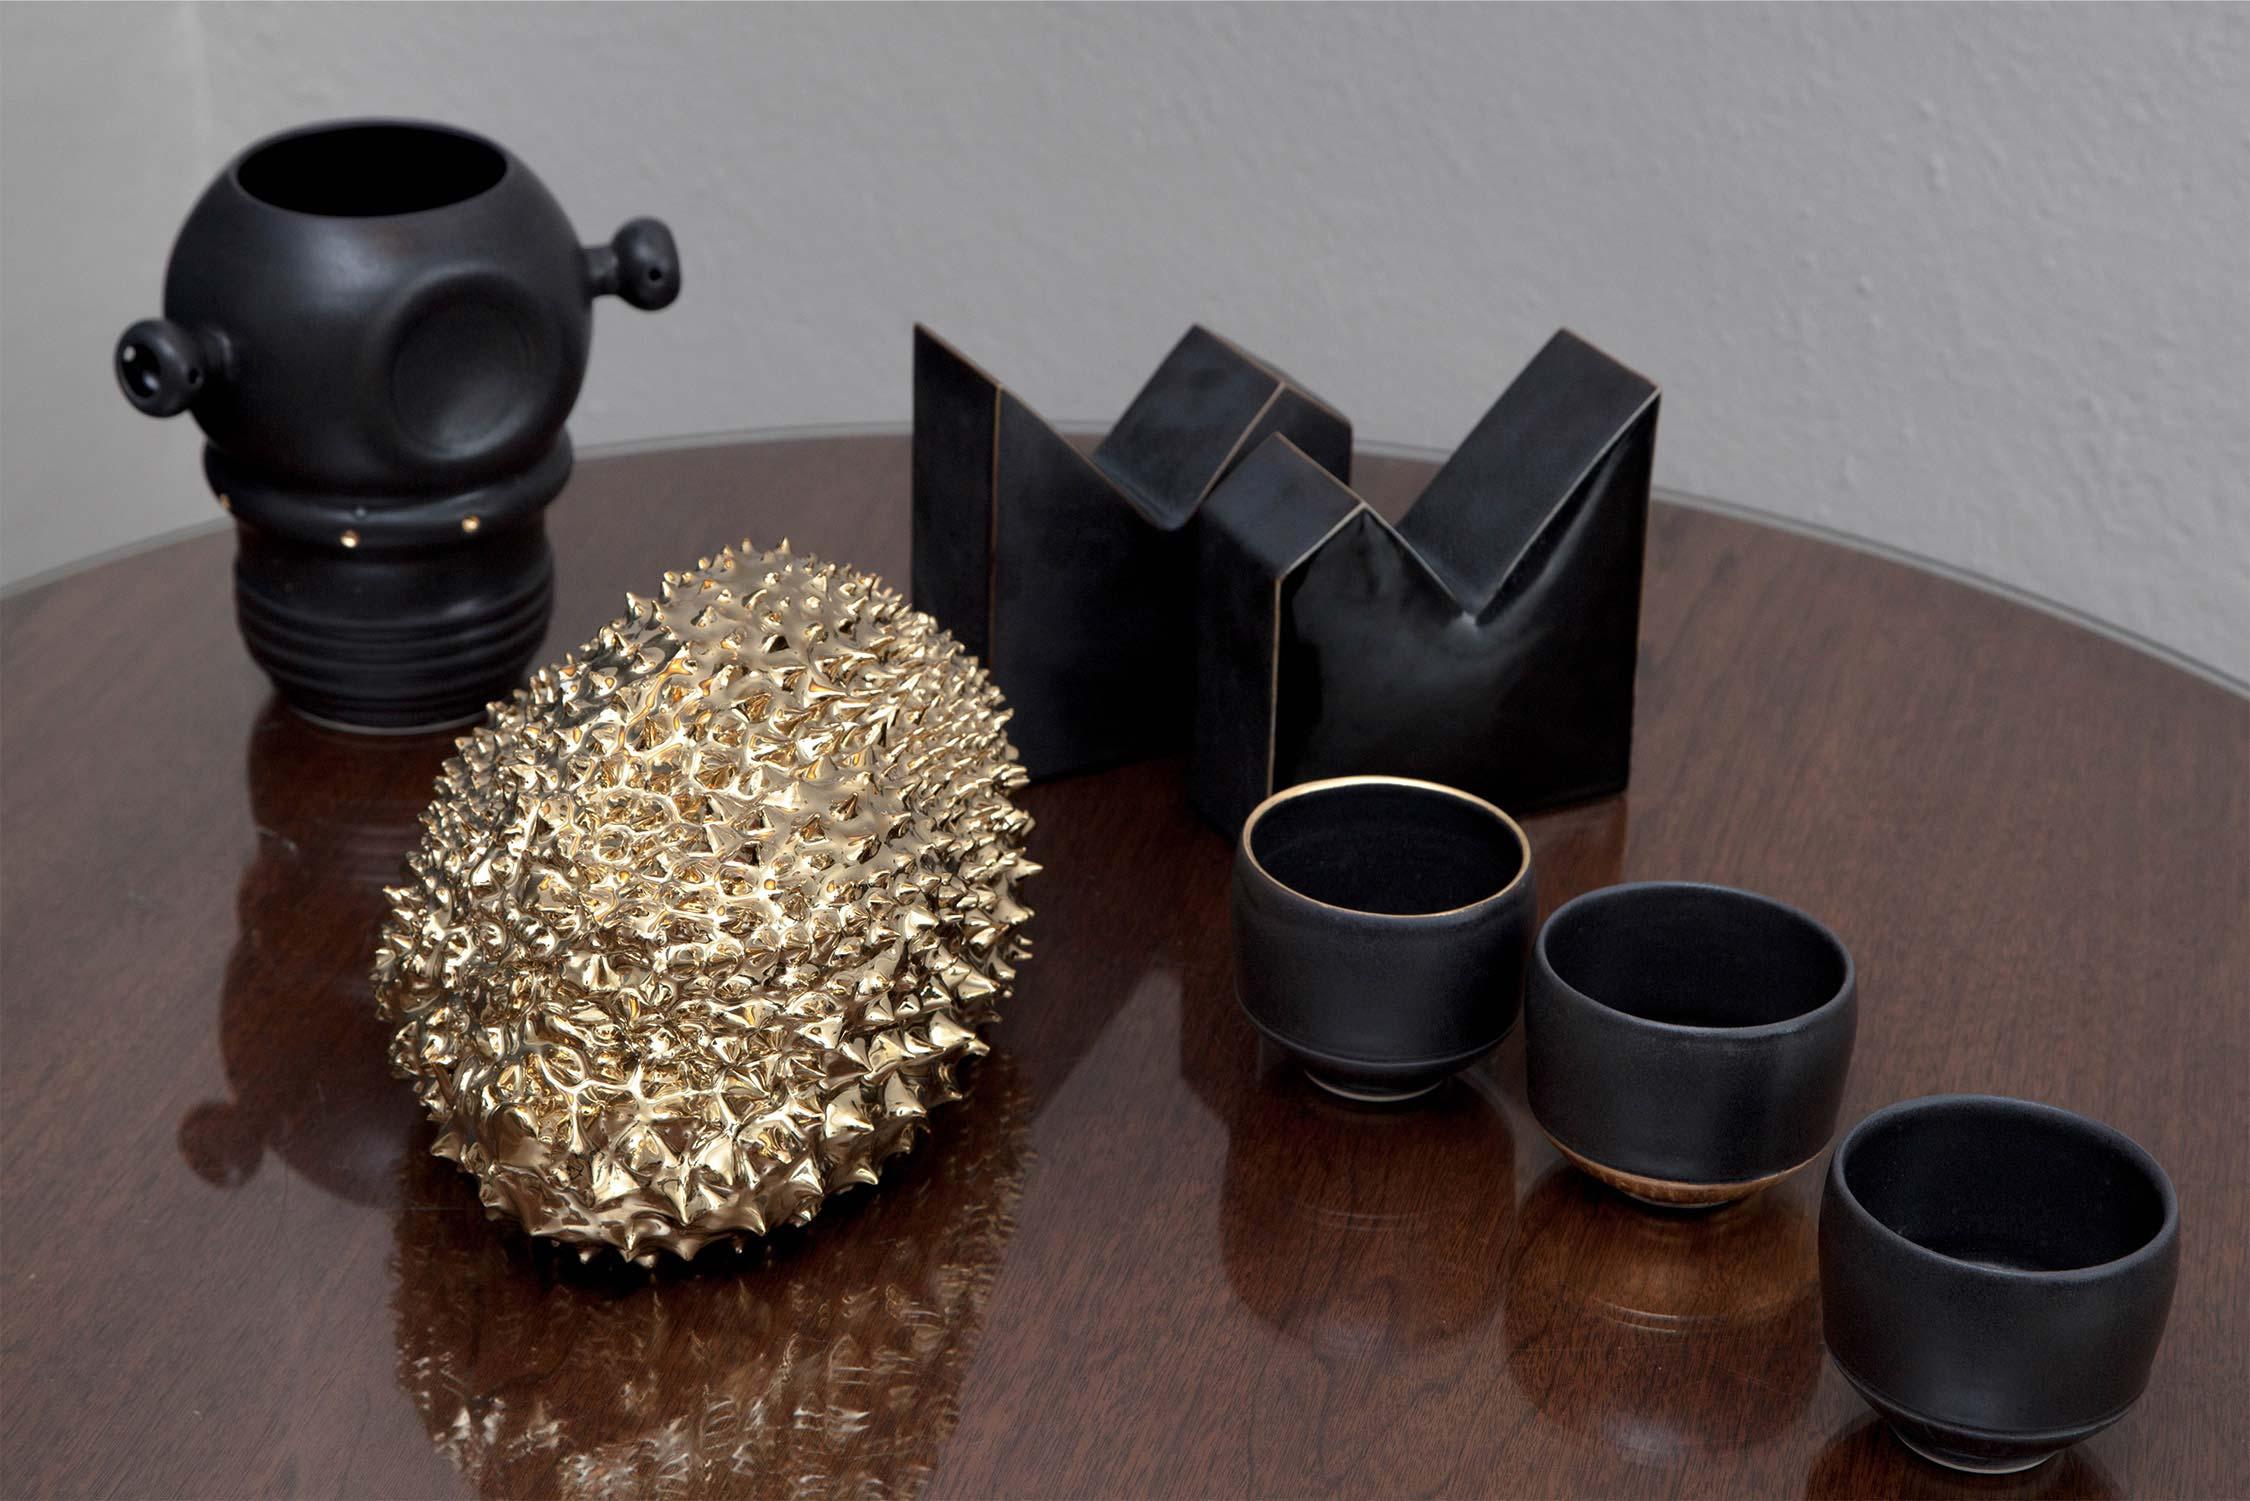 Maison_Girardin_2_Black&Or_2012